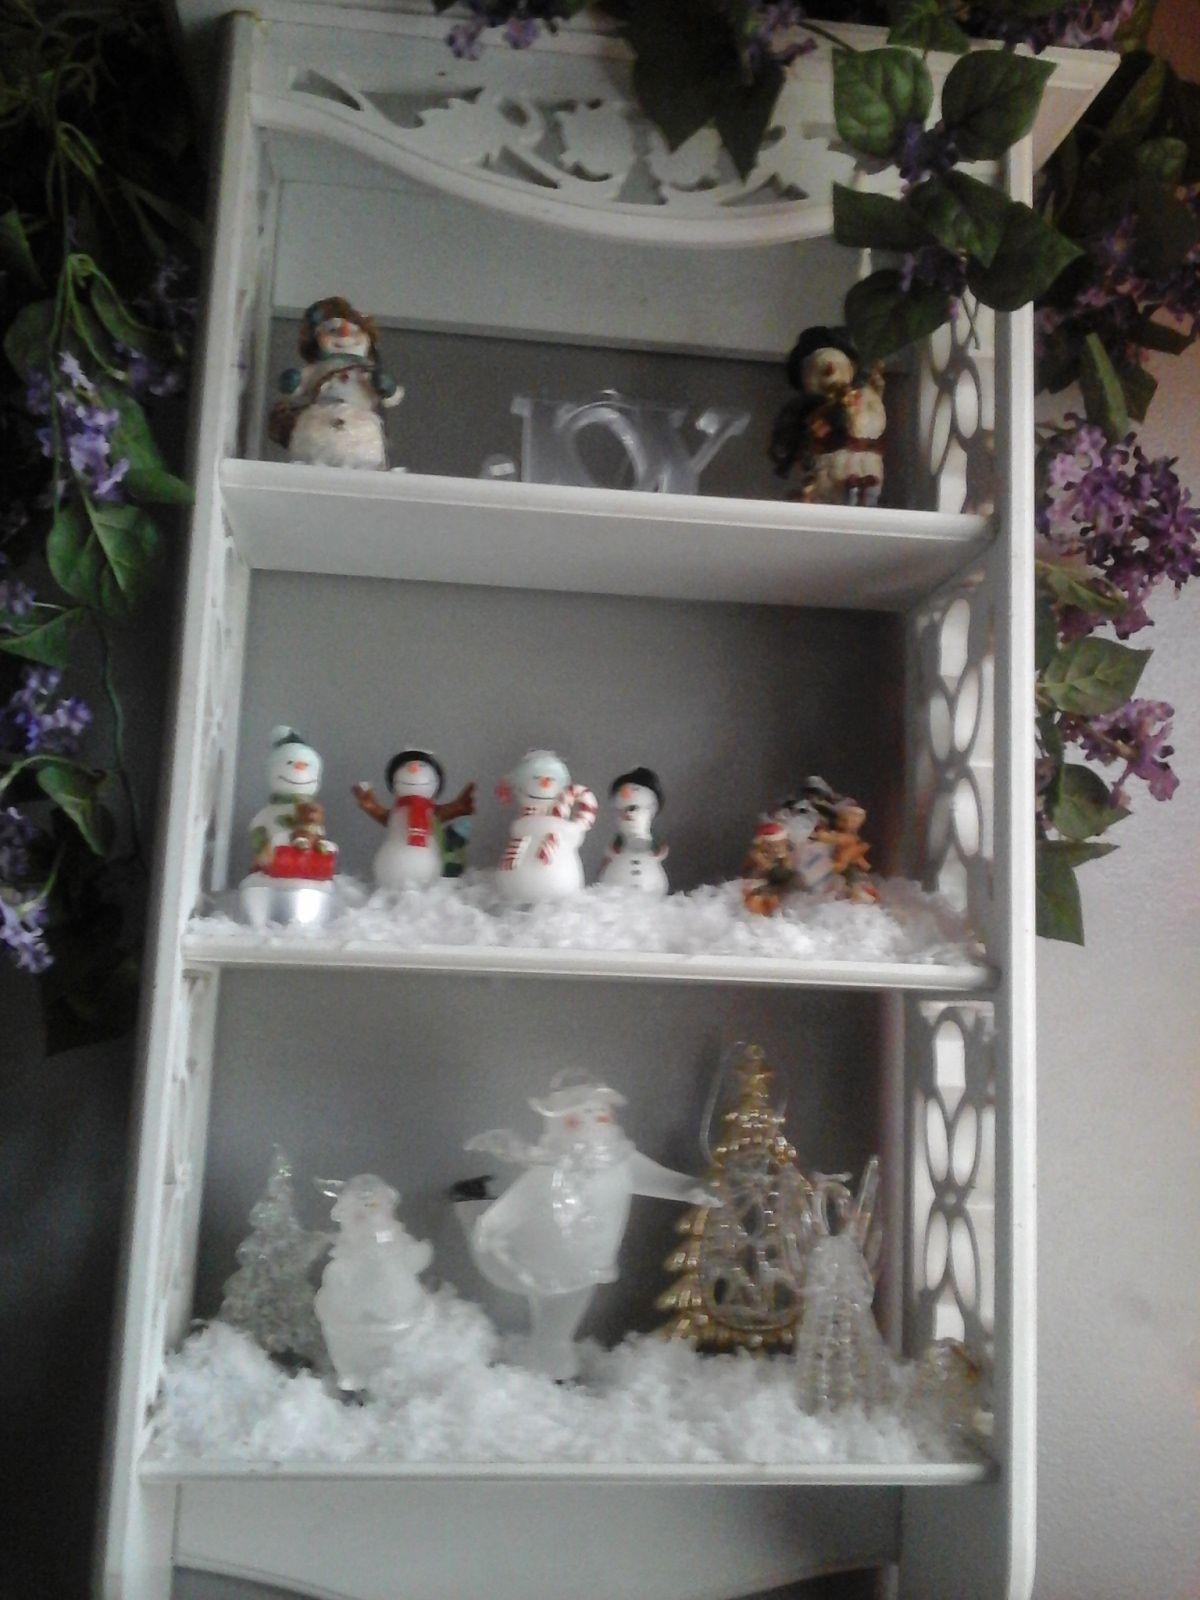 Snowman in the bathroon